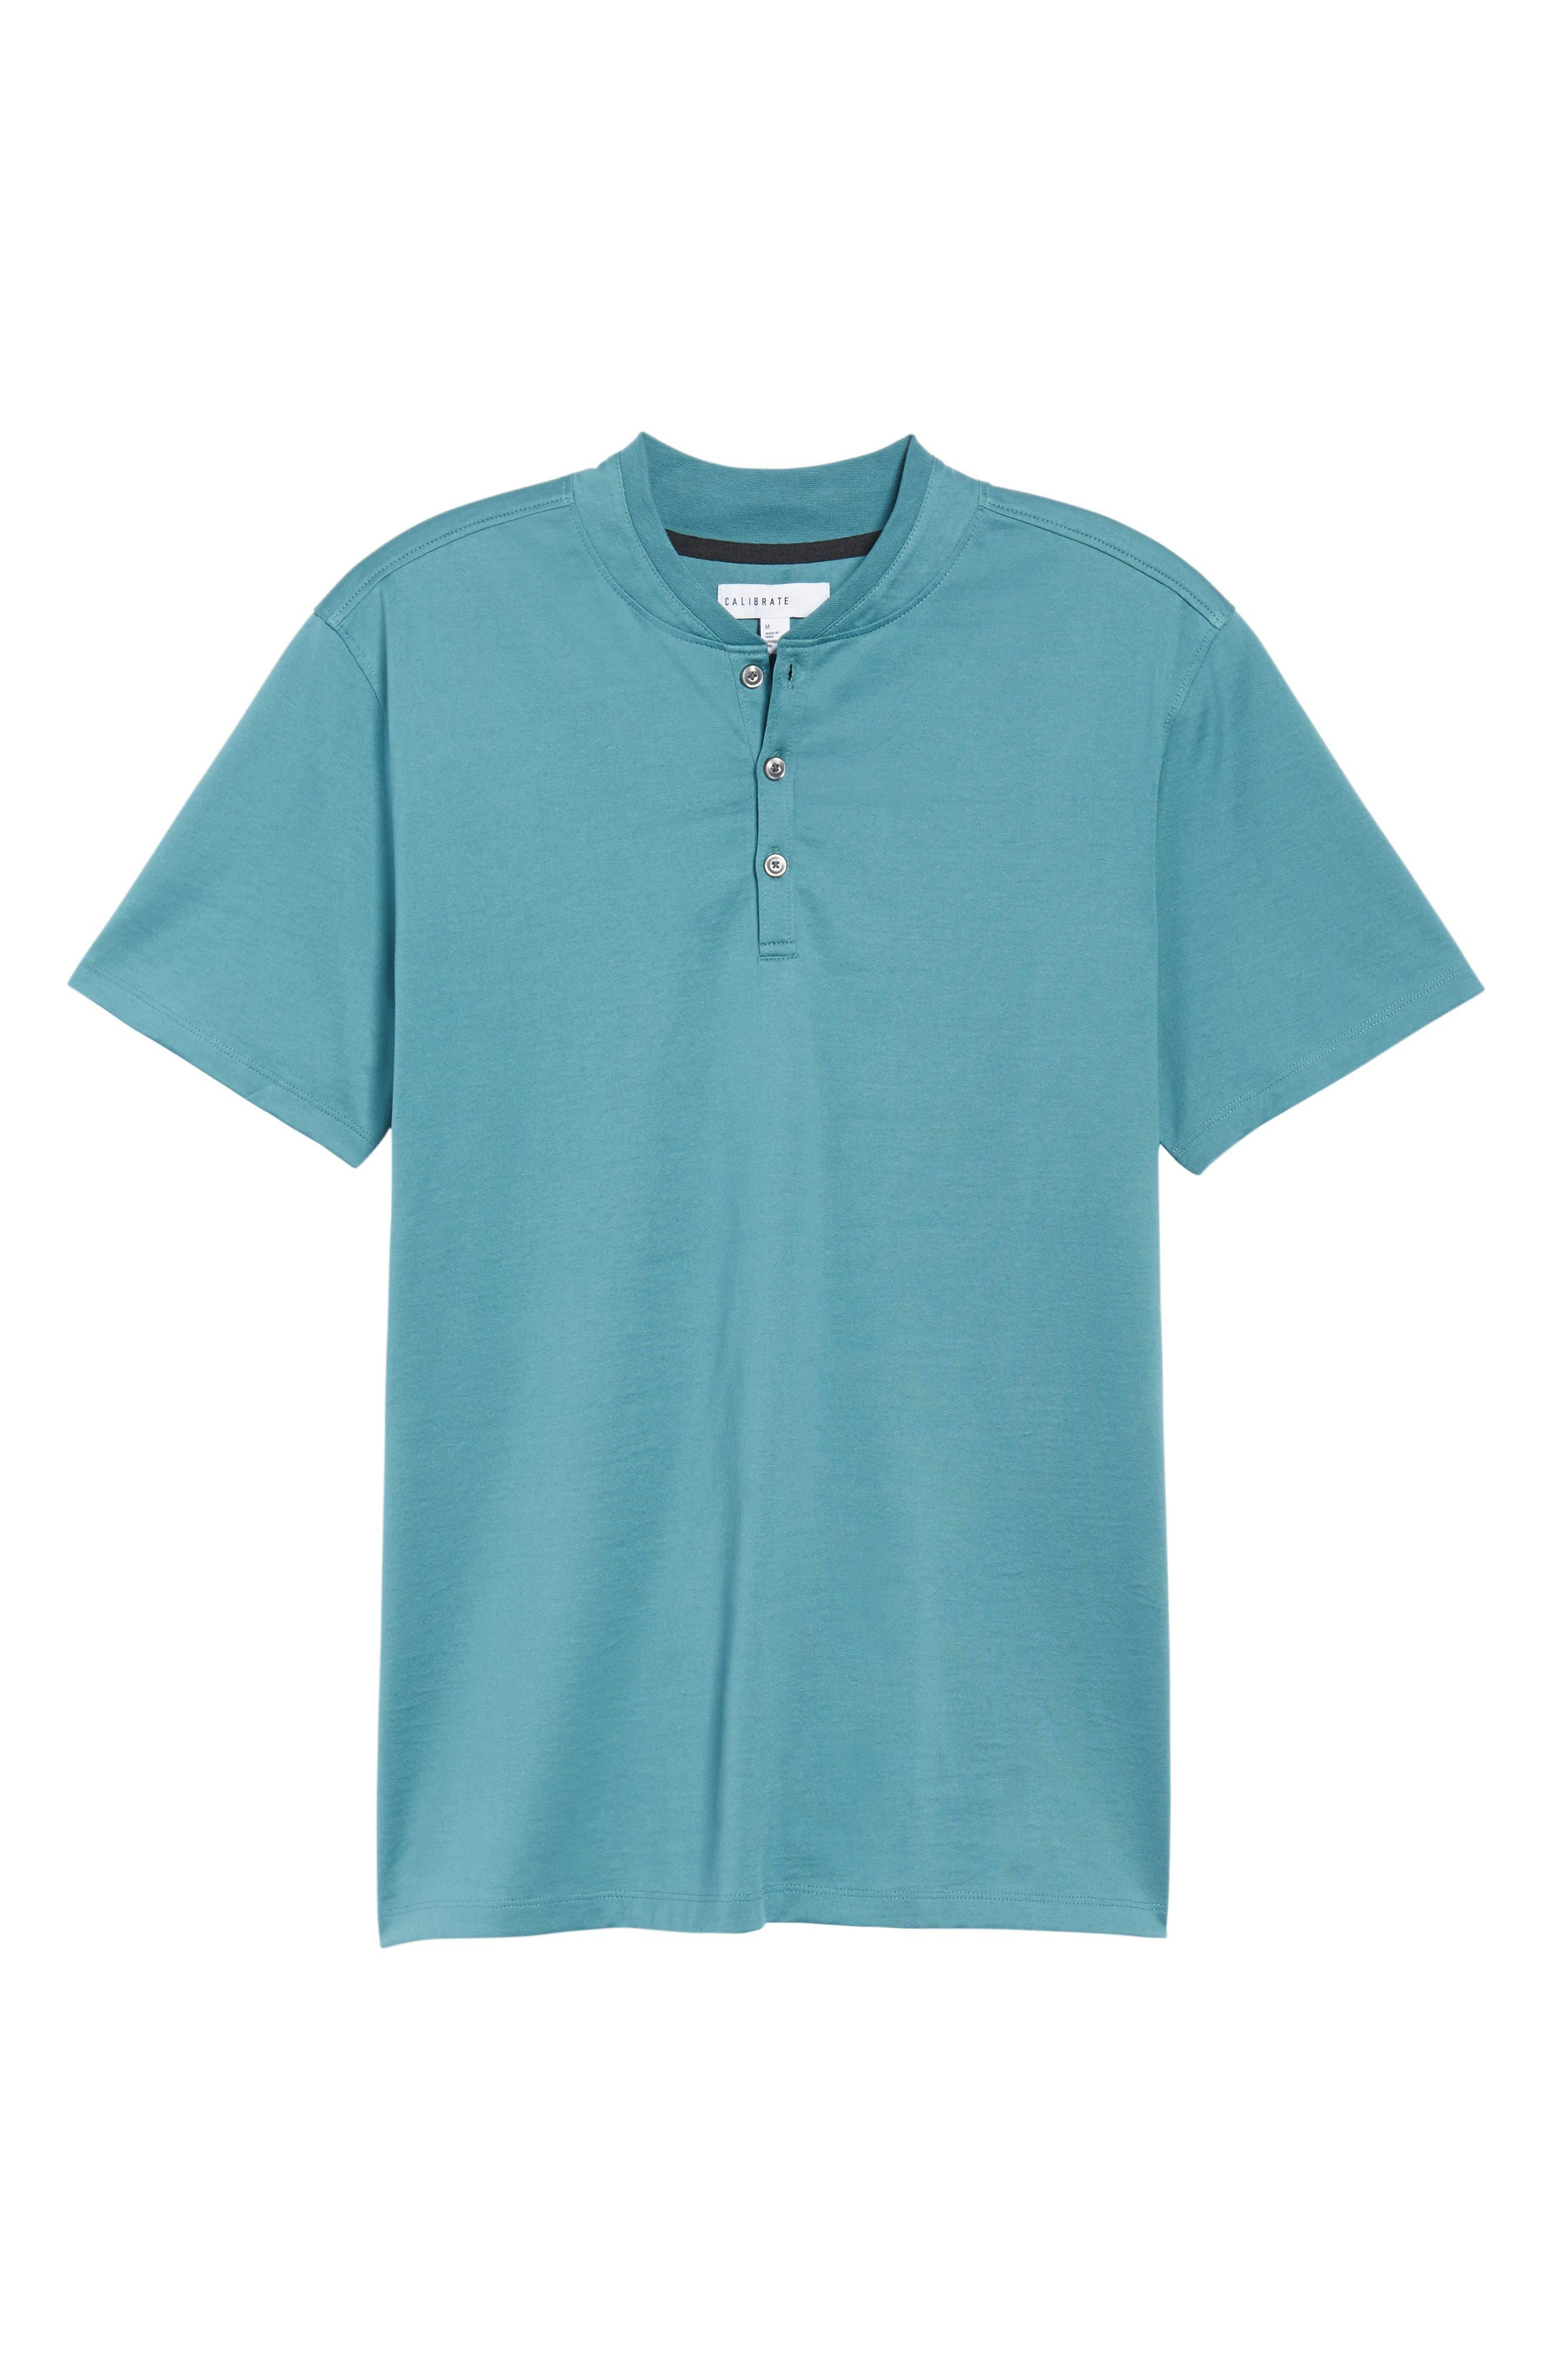 Trim Fit Fashion Polo,                             Alternate thumbnail 6, color,                             Teal Hydro